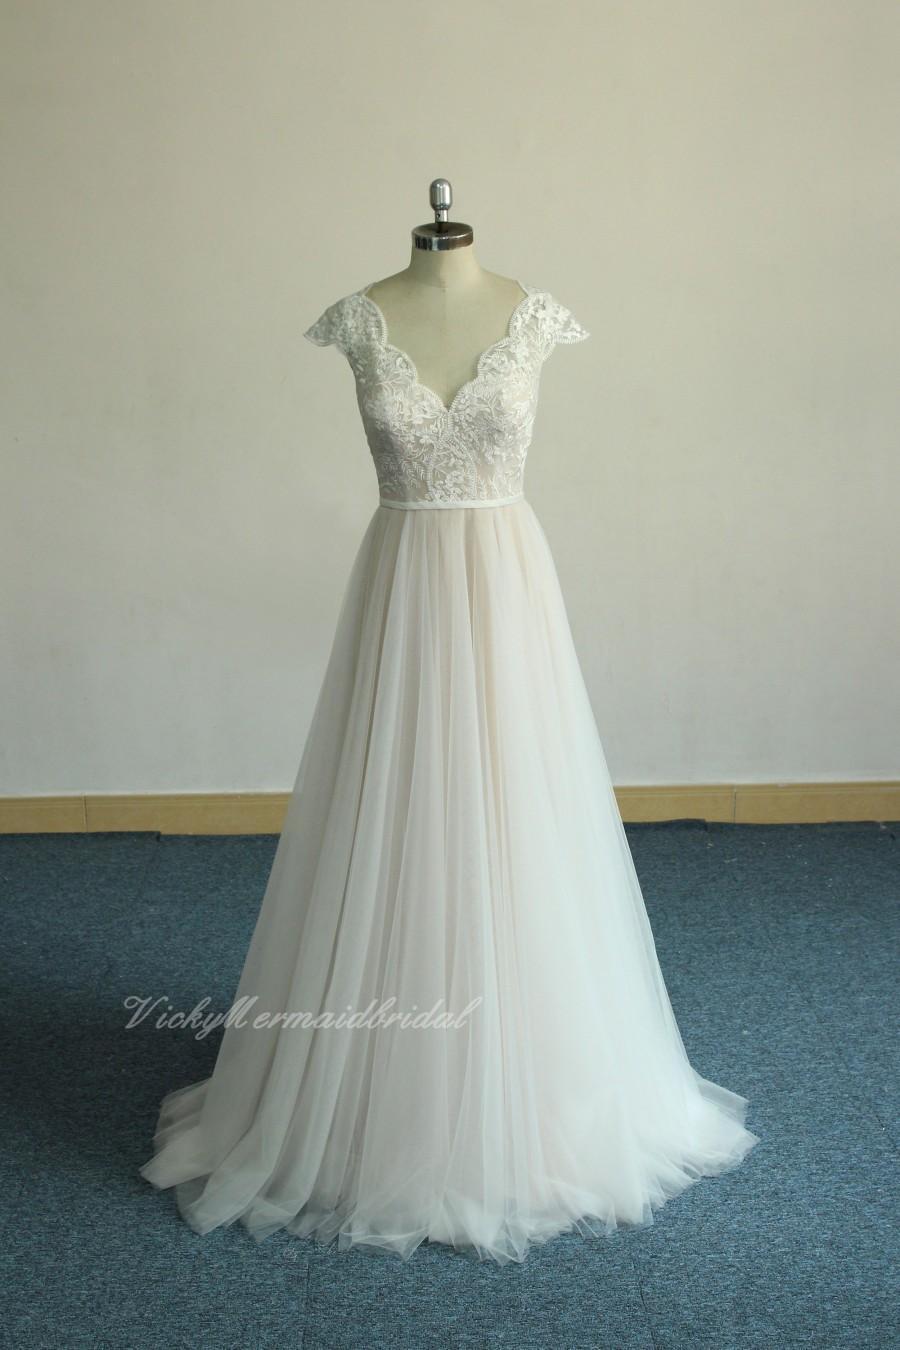 Wedding - High fashion A-line Bohemian Wedding Dress,Scallop Neckline Outdoor Wedding dress, Blush tulle Lace Weddin Dress with Capsleeves